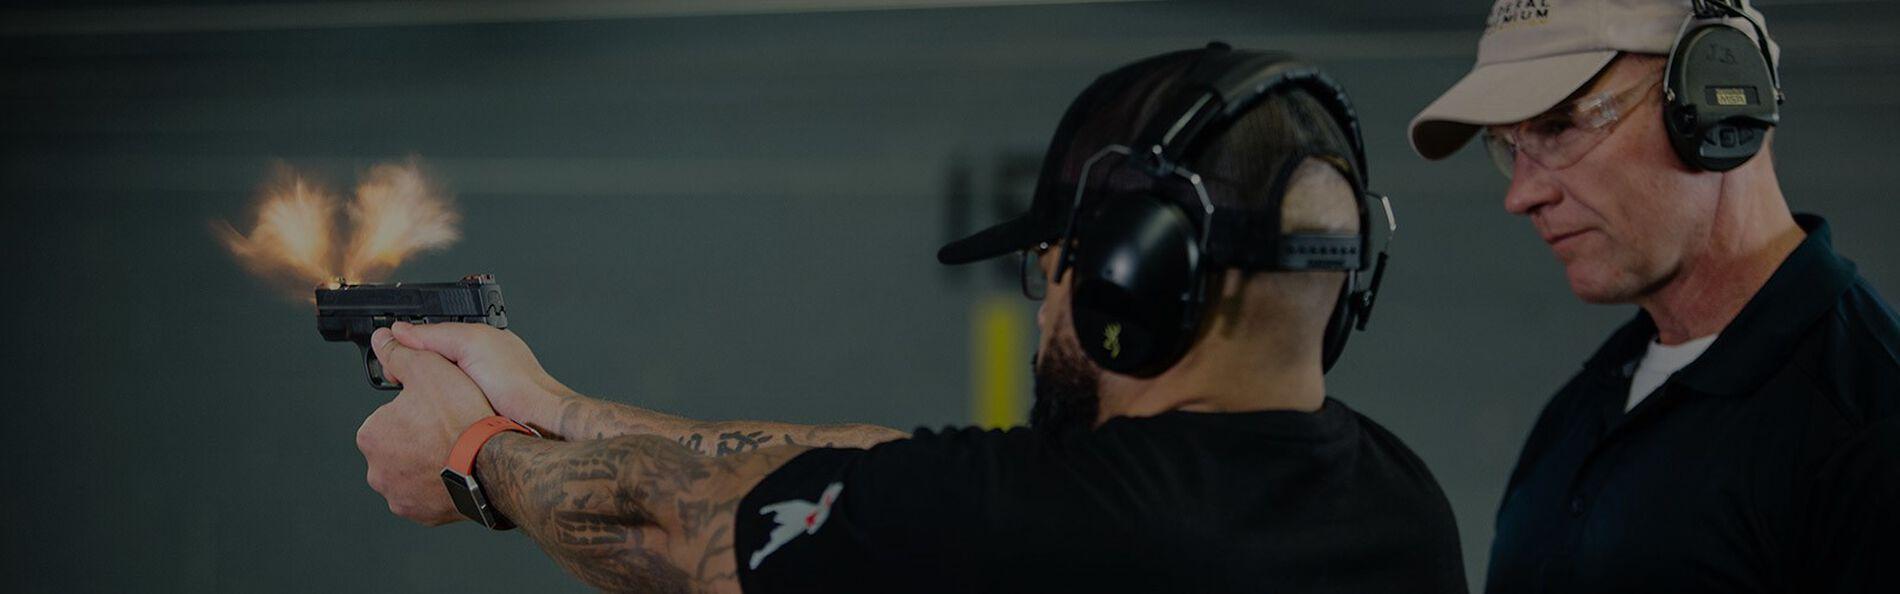 Female with Handgun